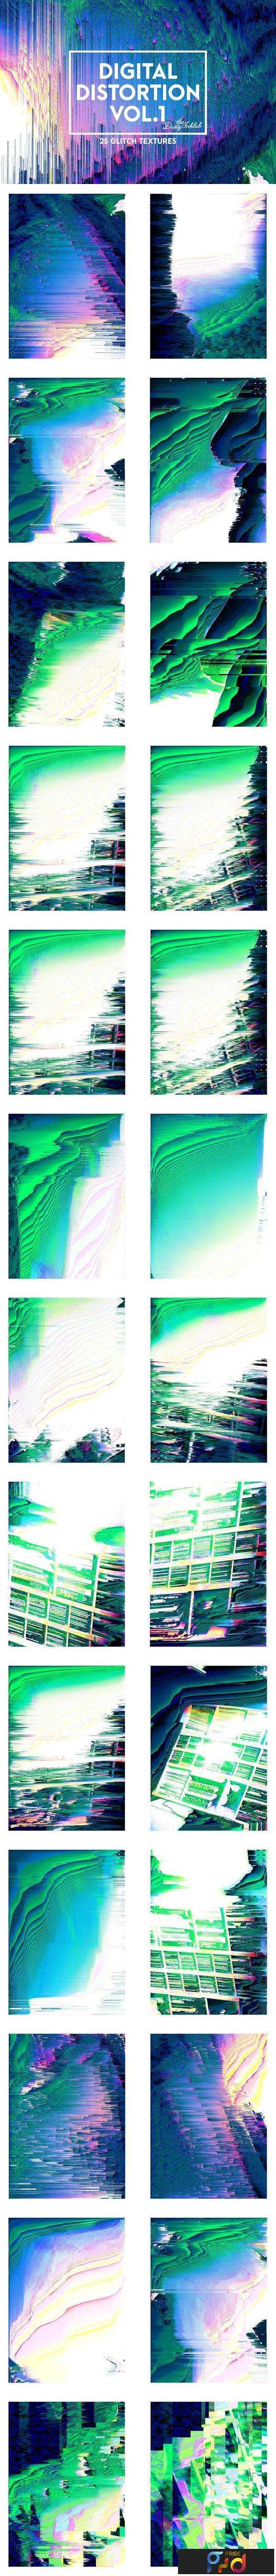 1805241 Digital Distortion Vol. 1 1861508 1